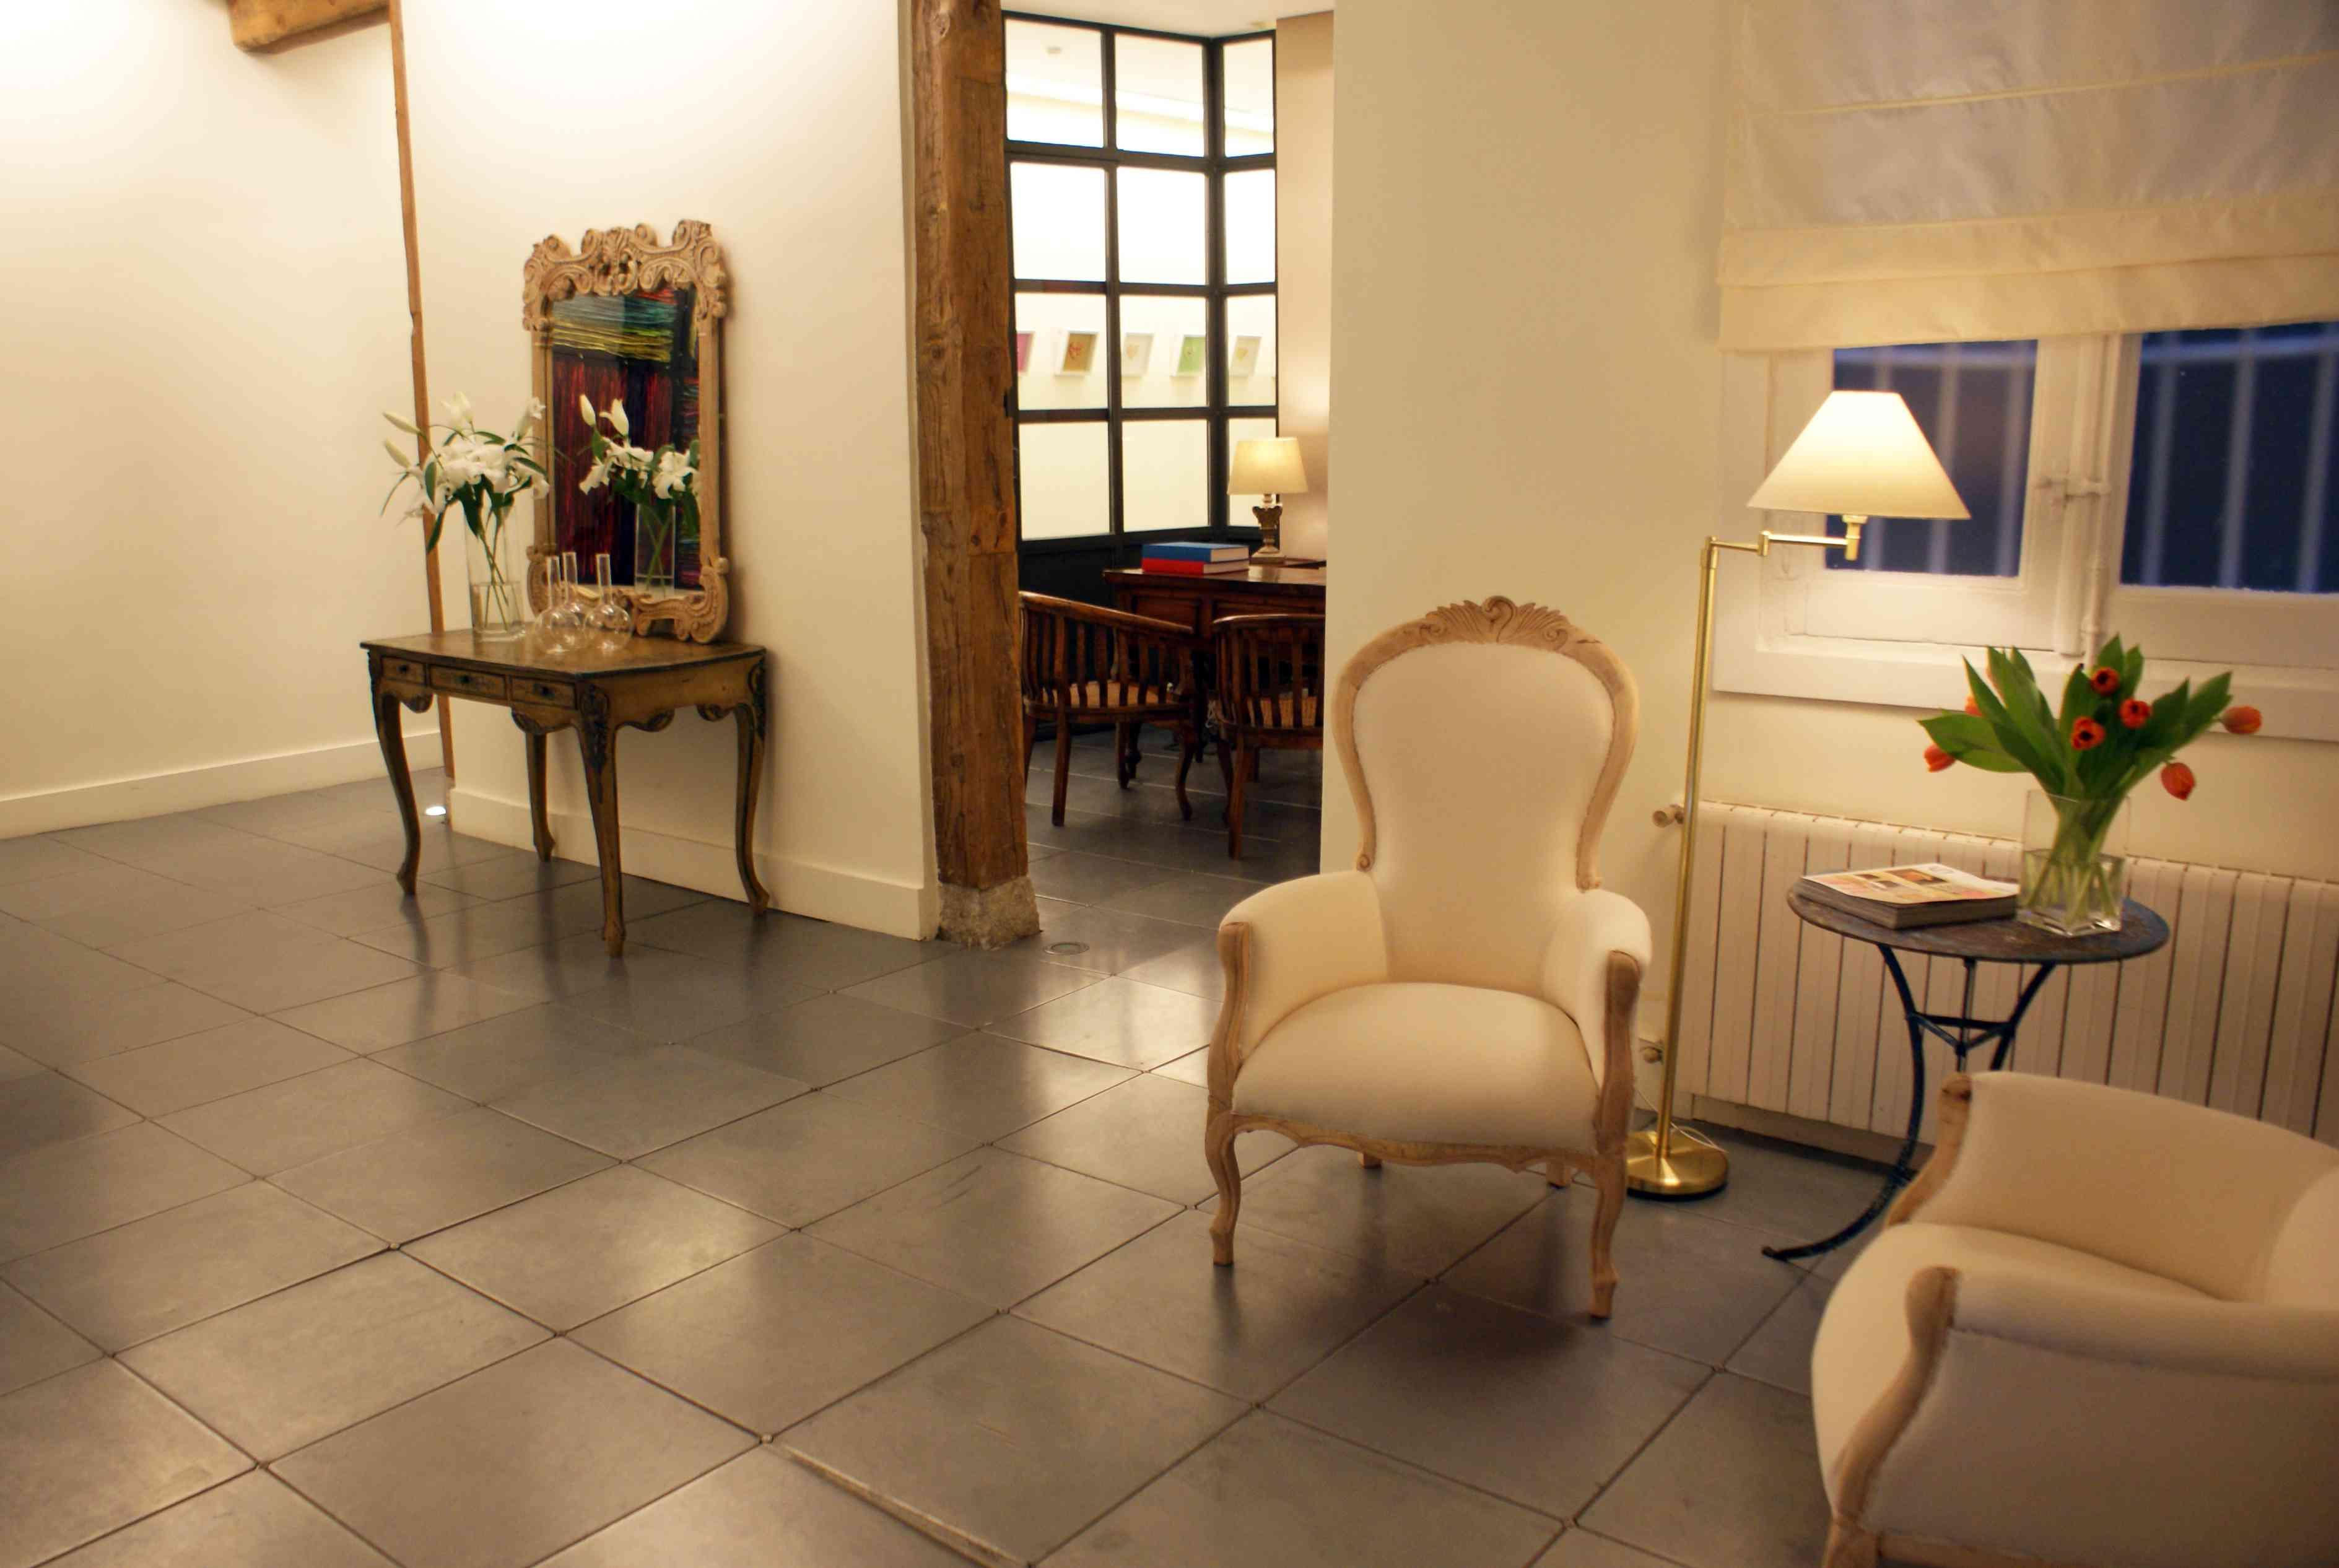 Una galer a de arte dentro de un centro de est tica - Esteticas decoracion interiores ...